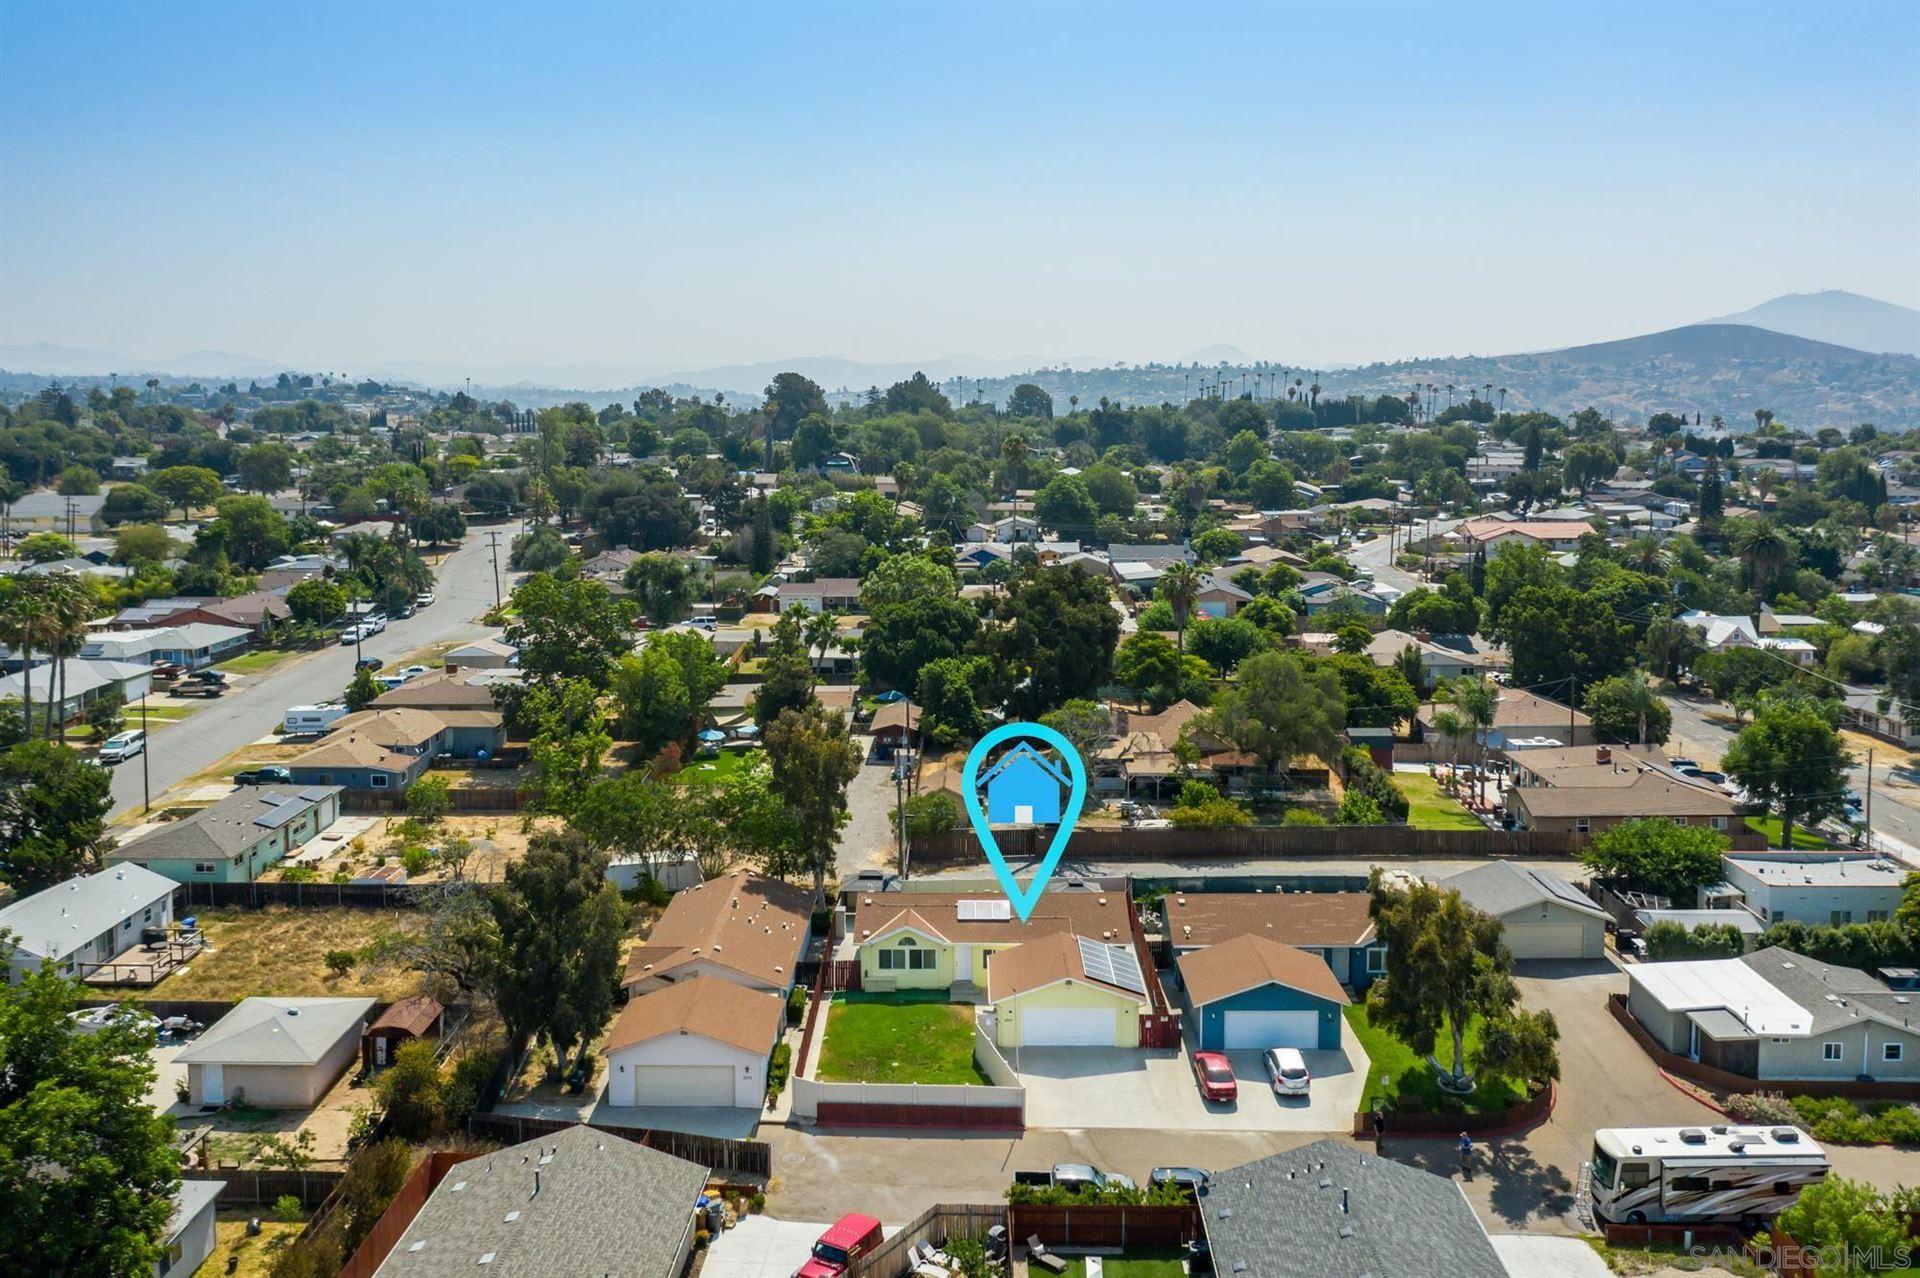 Photo of 3055 Julielynn Way, Lemon Grove, CA 91945 (MLS # 210020065)